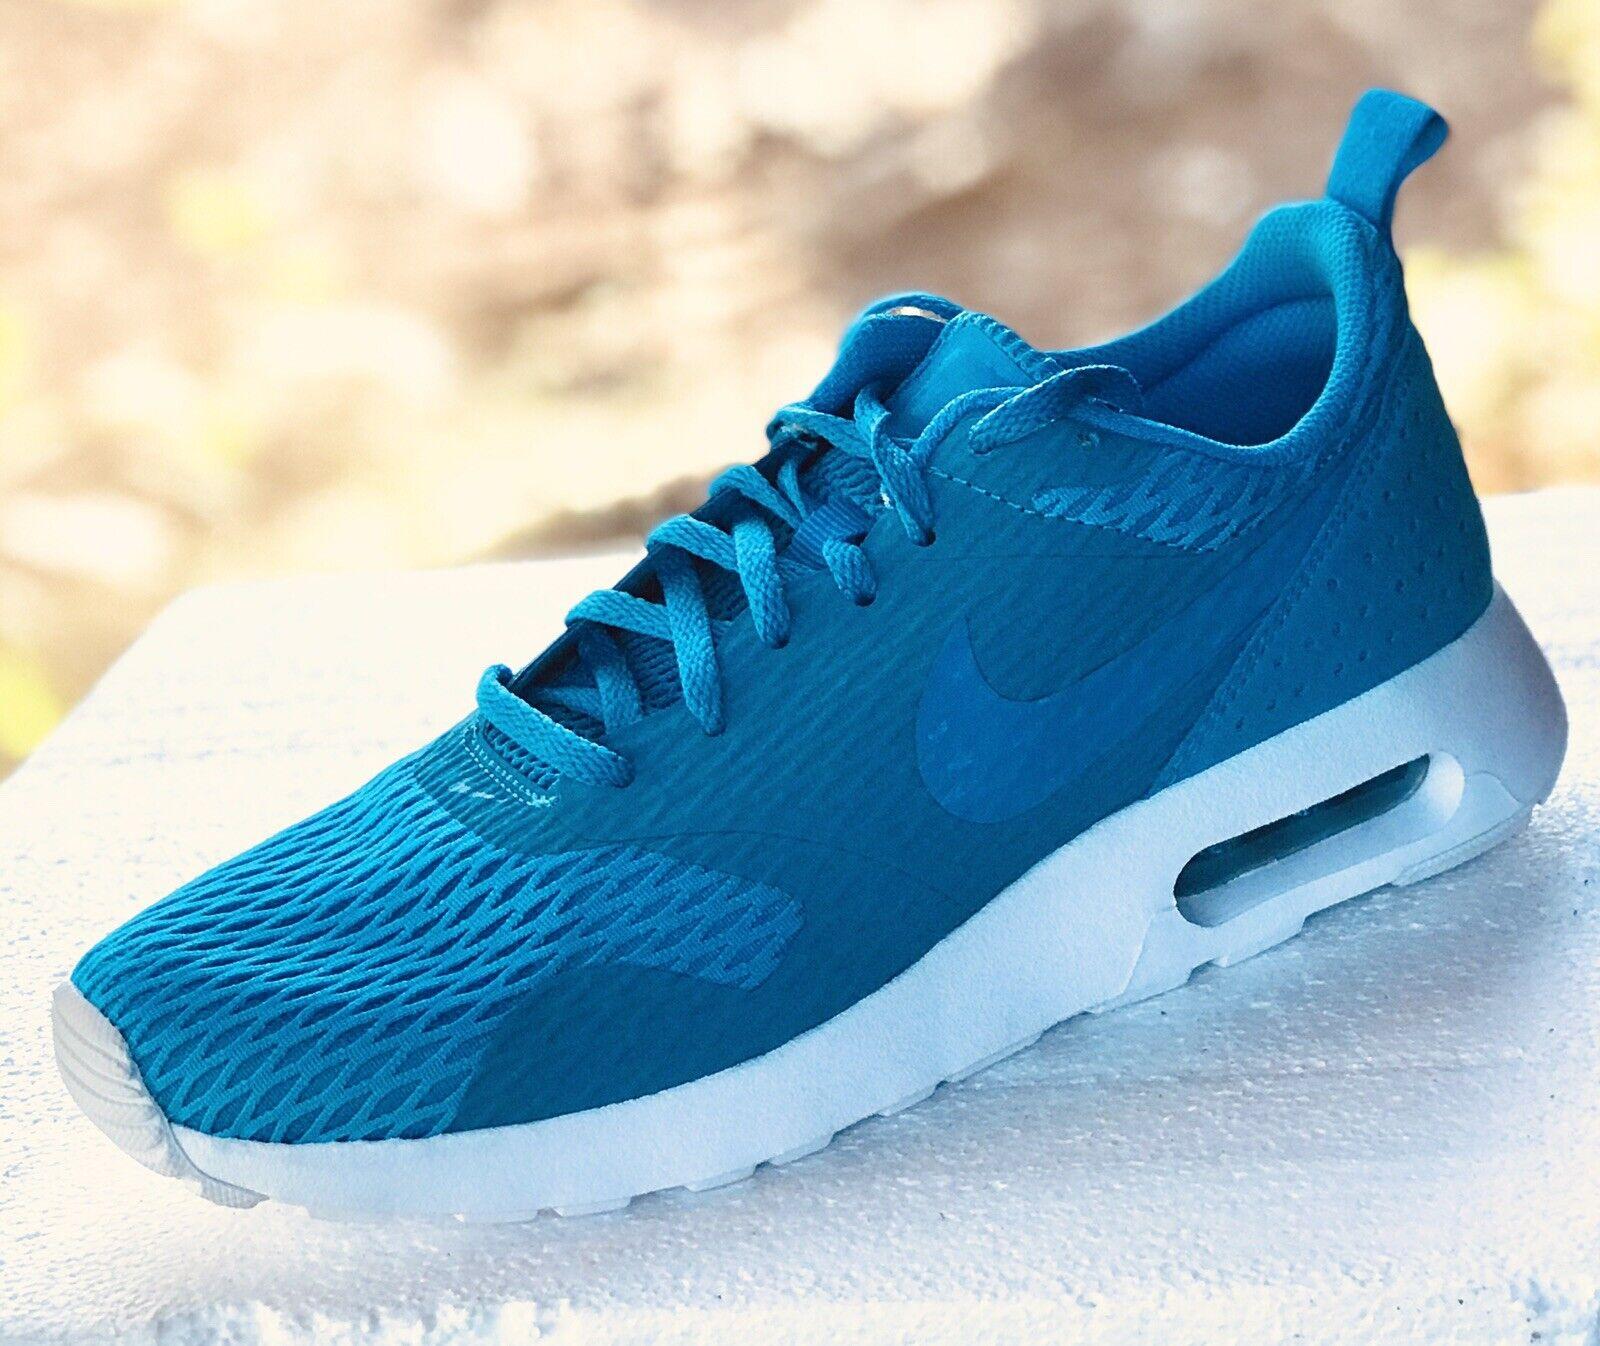 NIKE AIR MAX TAVAS TAVAS TAVAS SE REGULAR Running shoes 718895-402 Mens 7.5   Cyan bluee NEW 746541